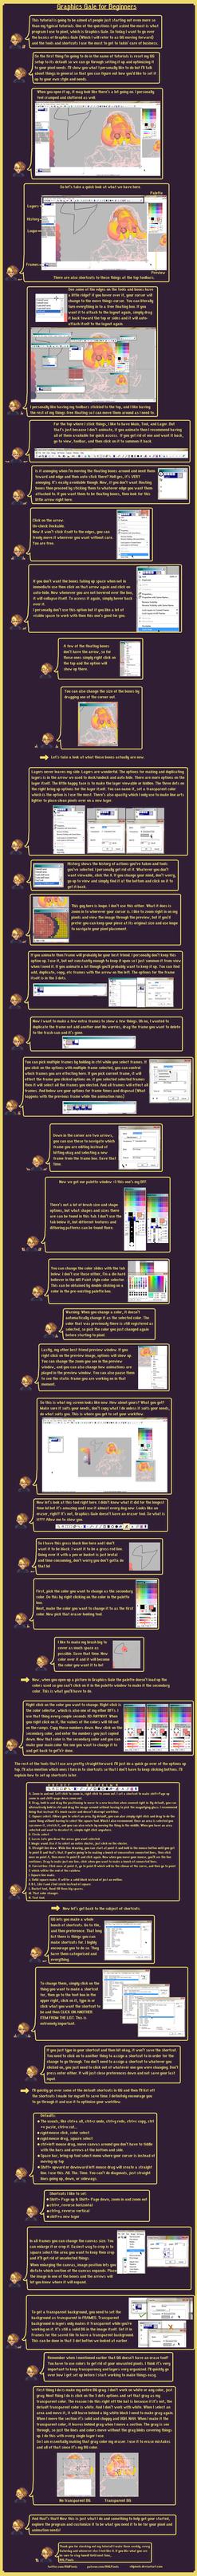 Tutorial for Beginners: Graphics Gale Rundown by RHLPixels